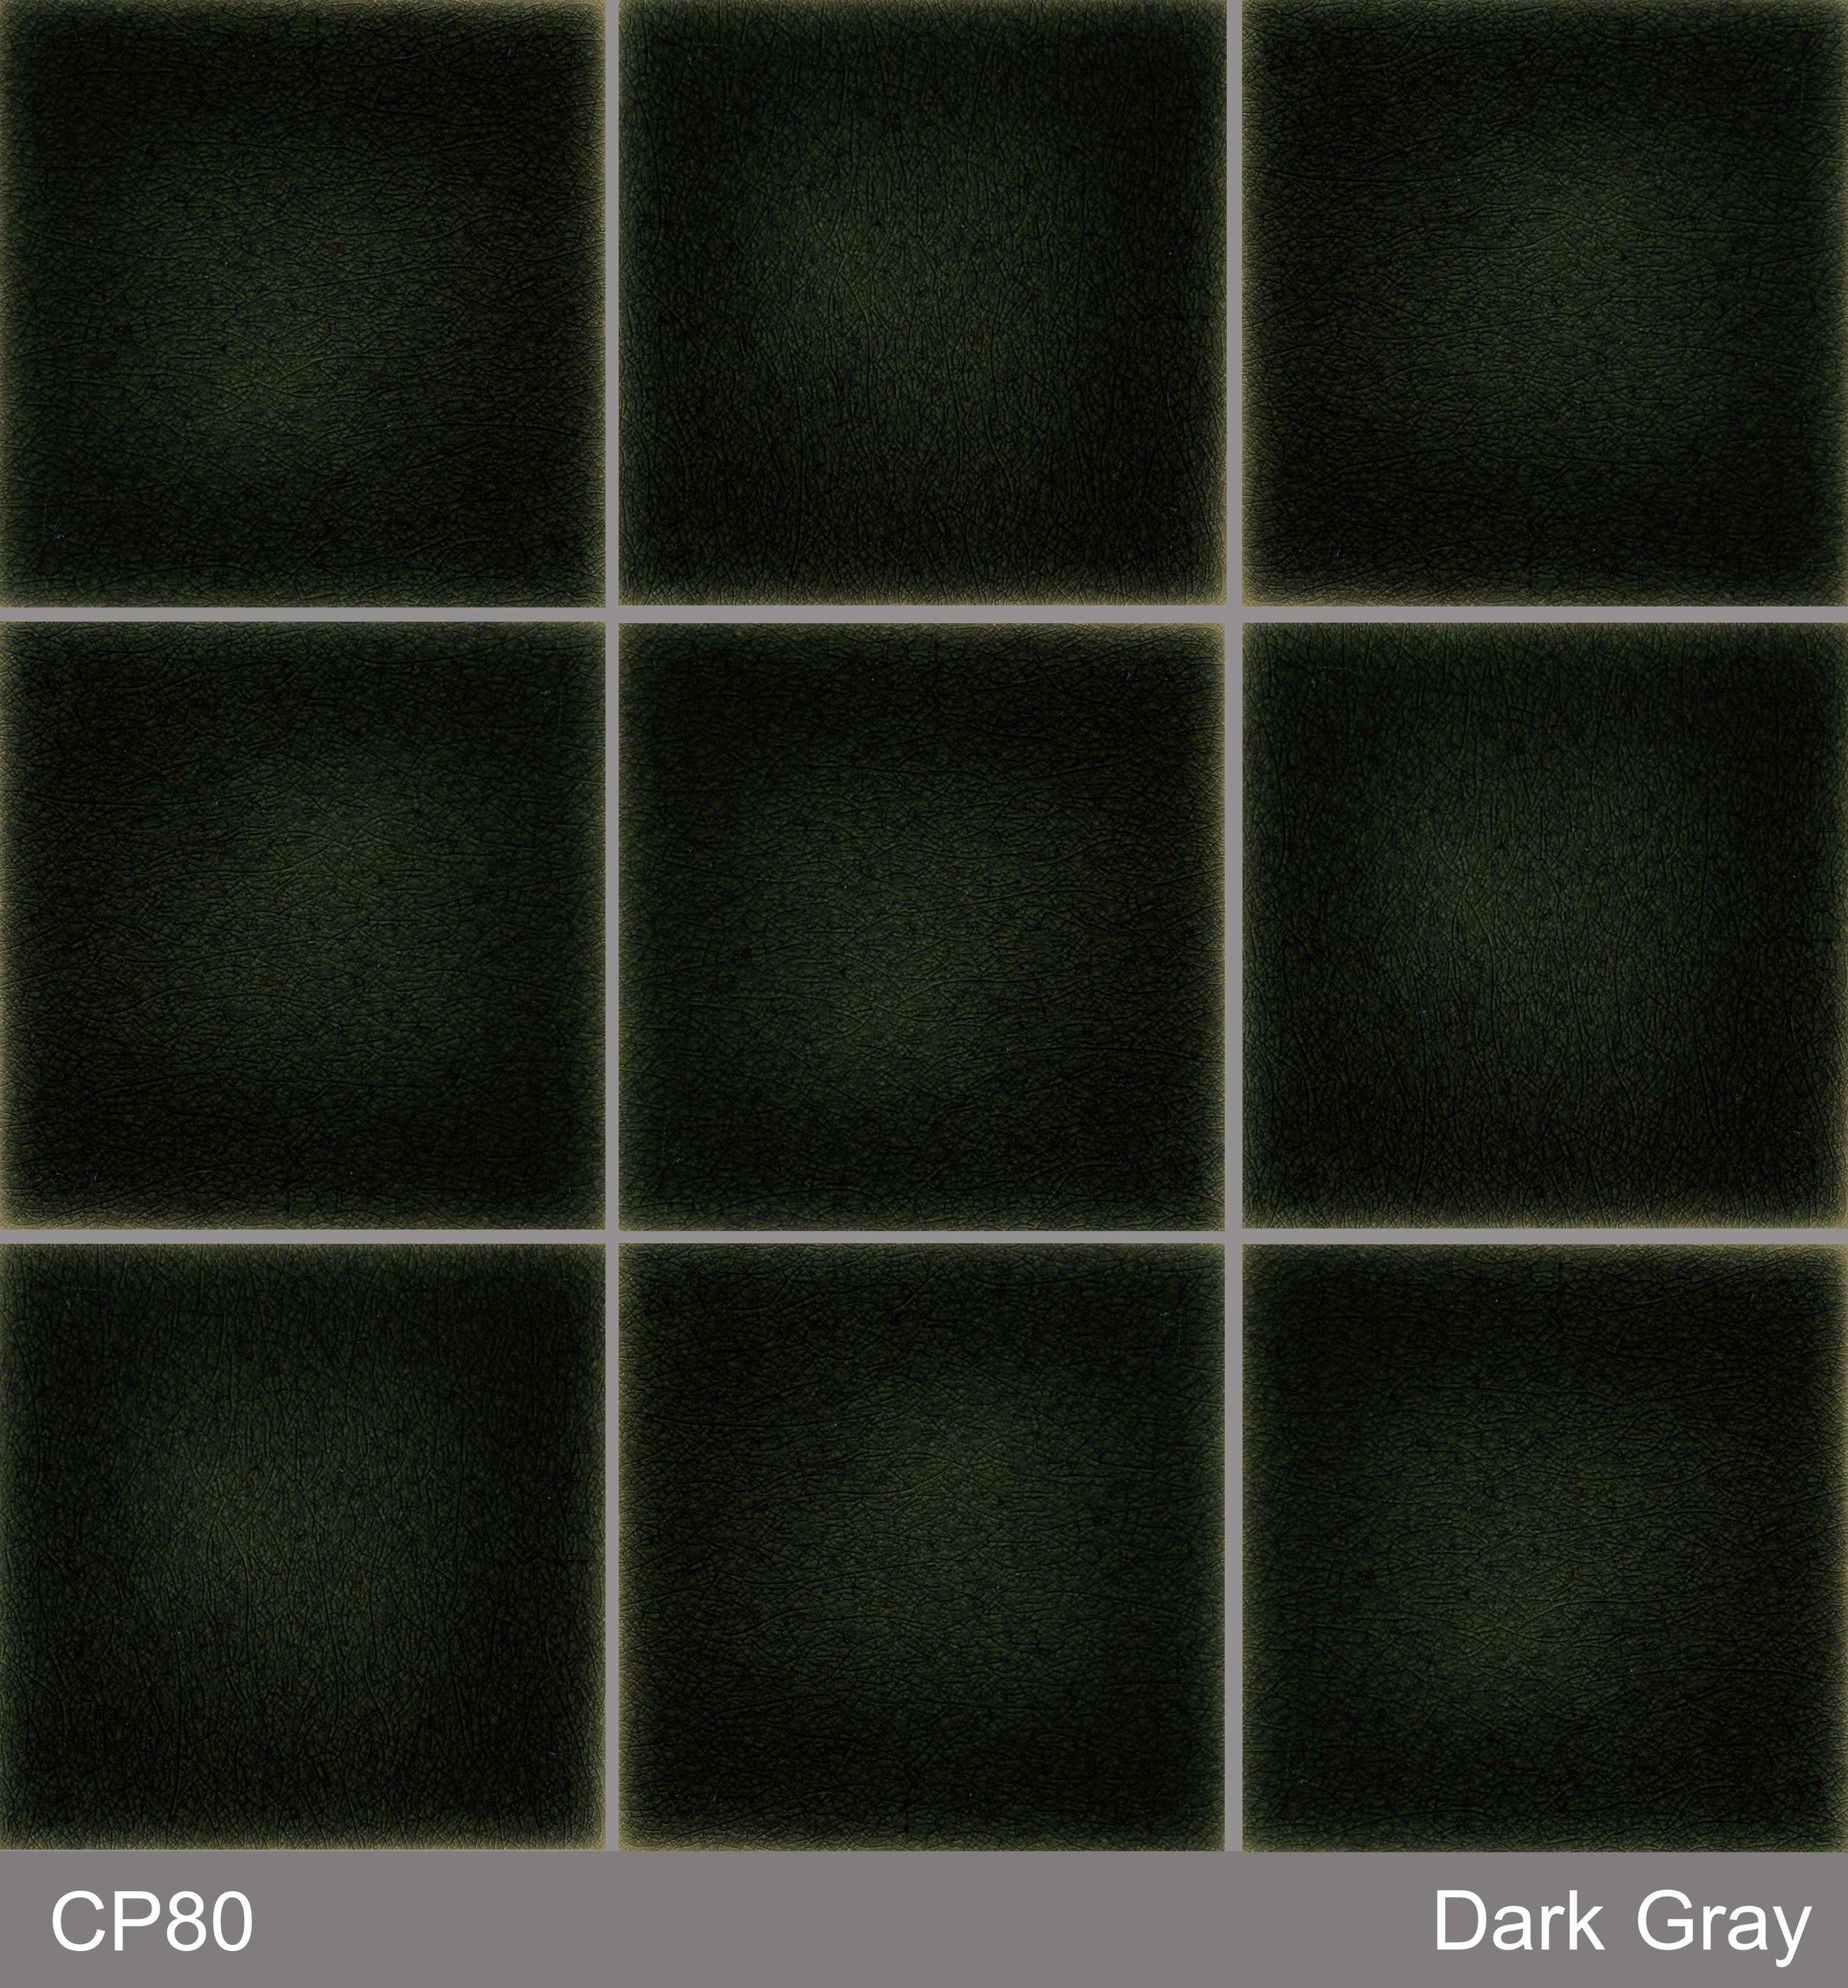 CP80 : Dark gray